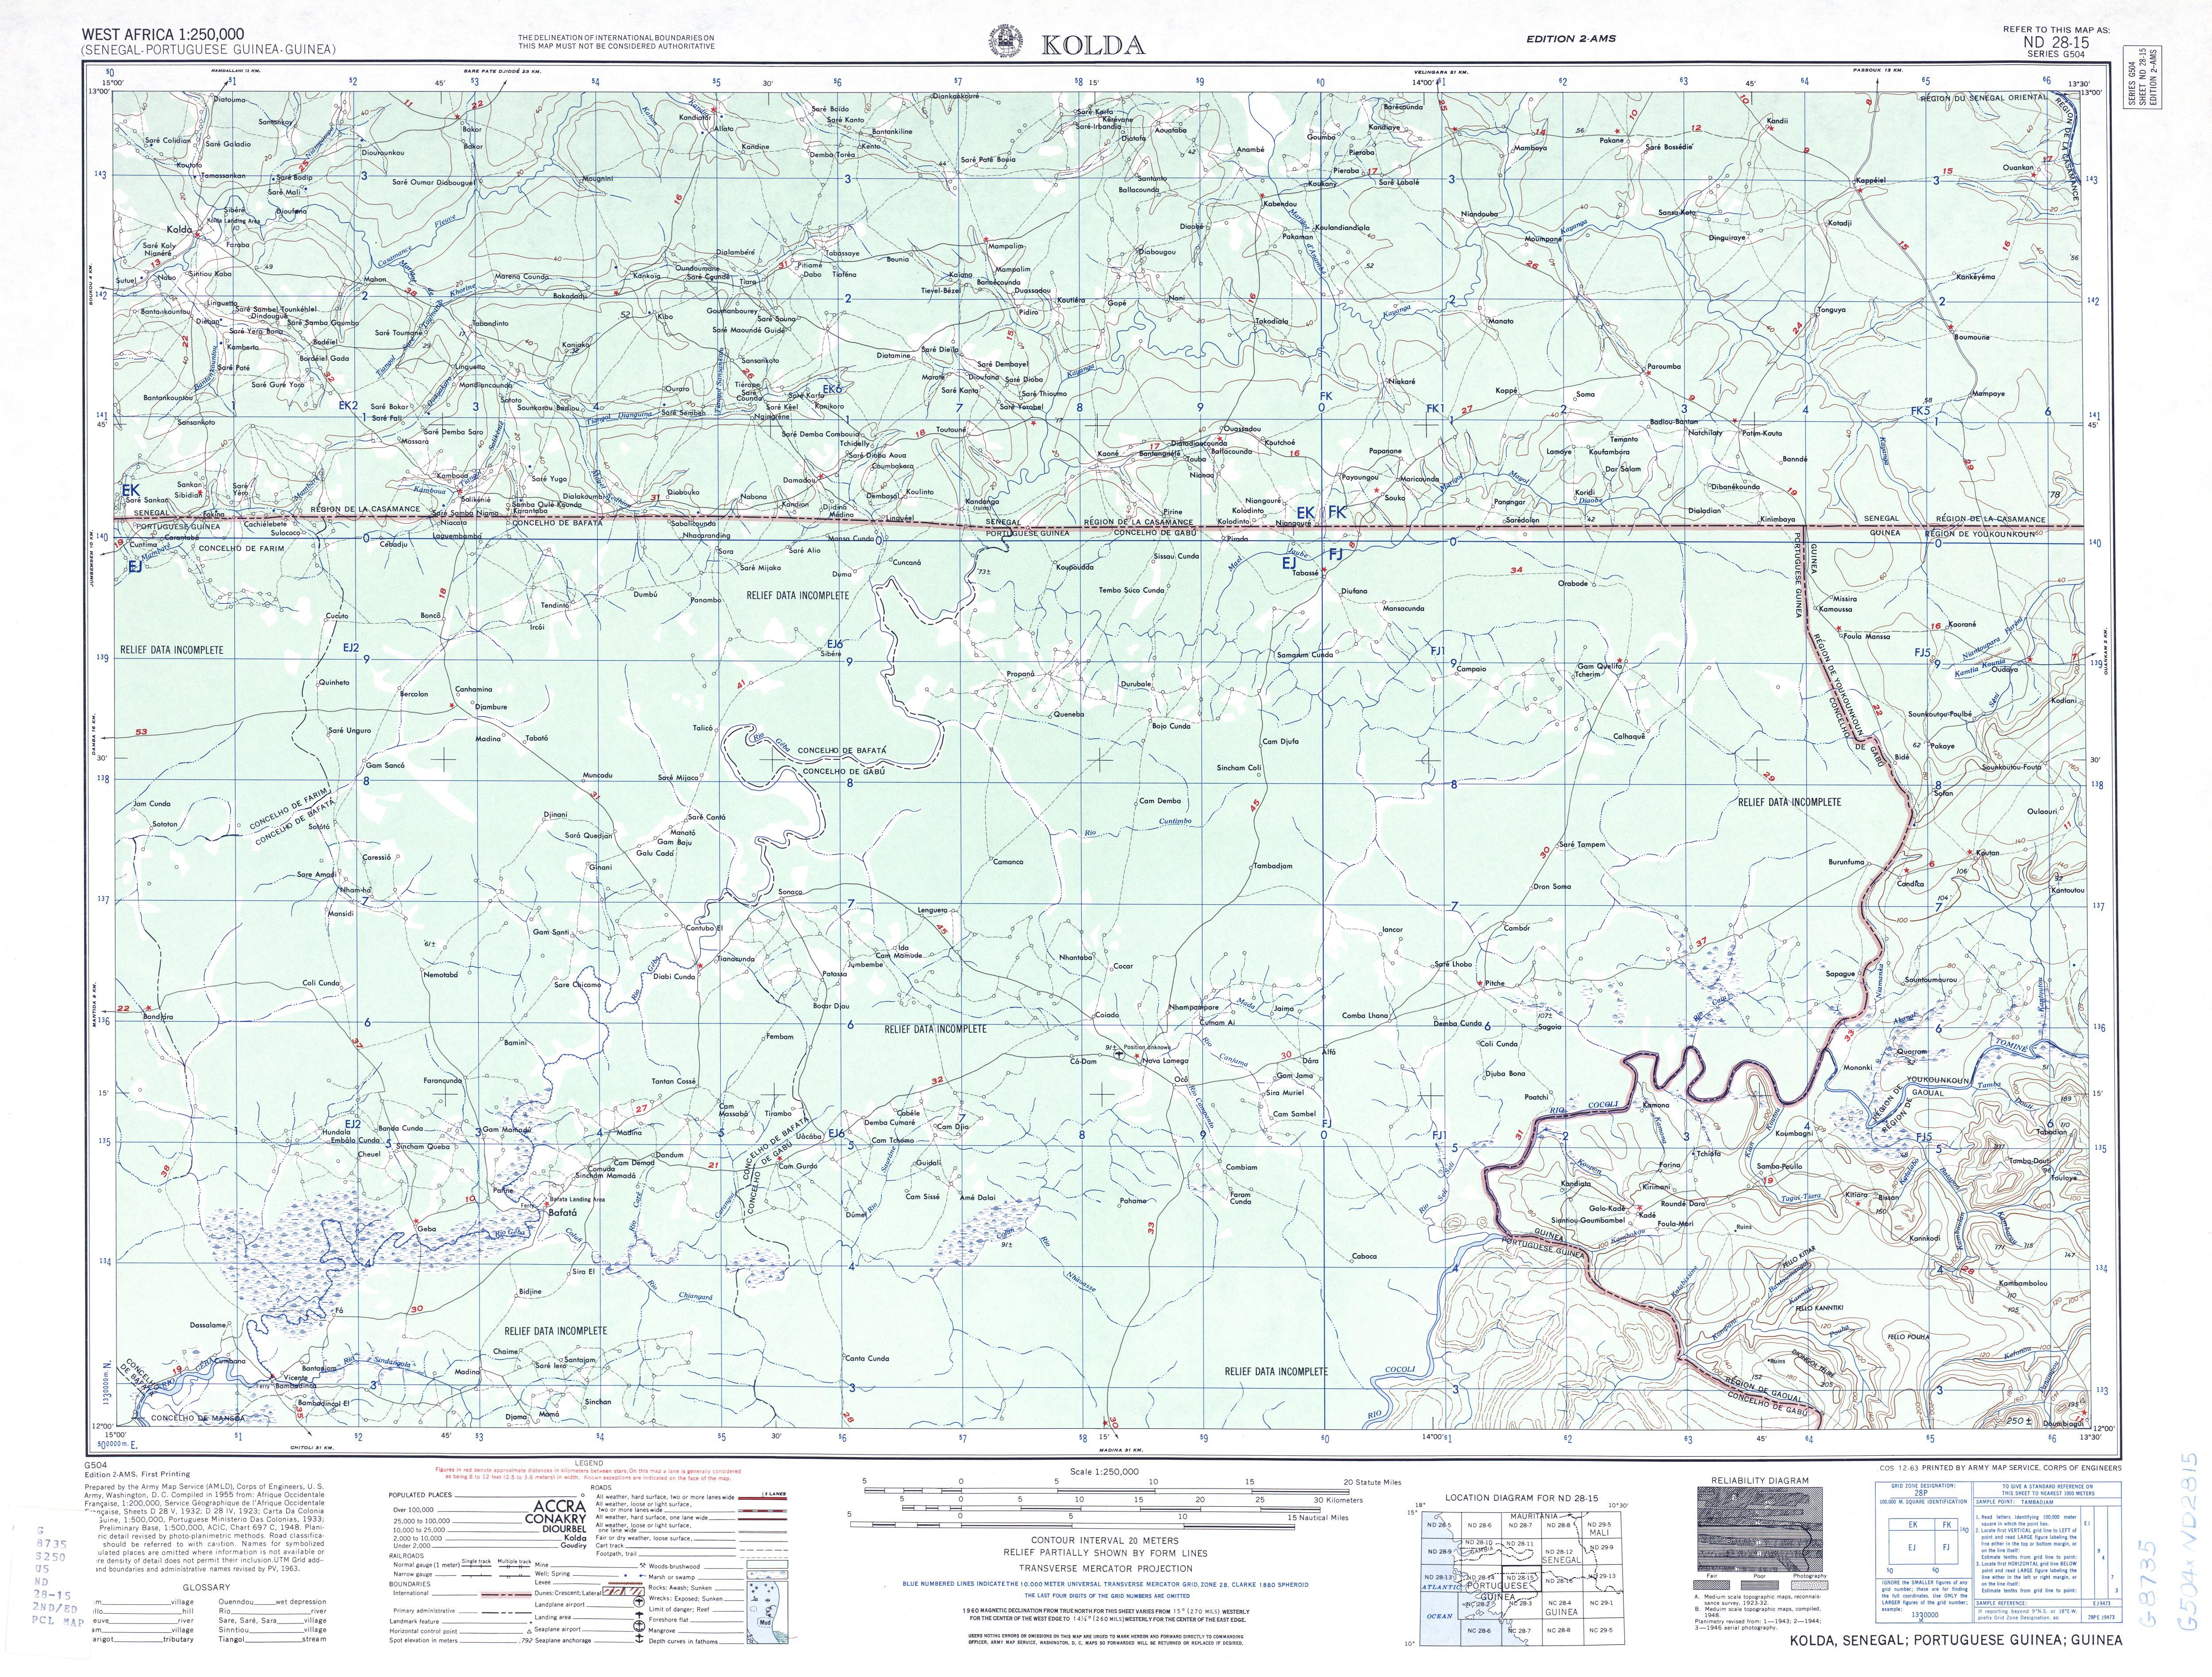 Hoja Kolda del Mapa Topográfico de África Occidental 1955